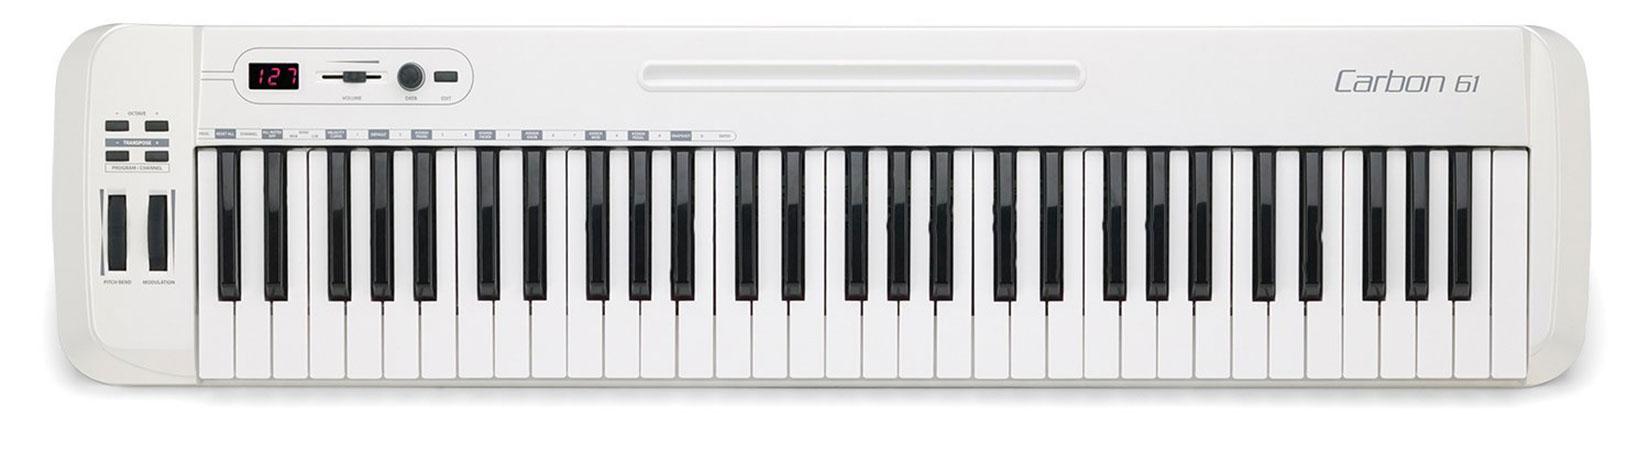 Carbon 61 USB MIDI Controller